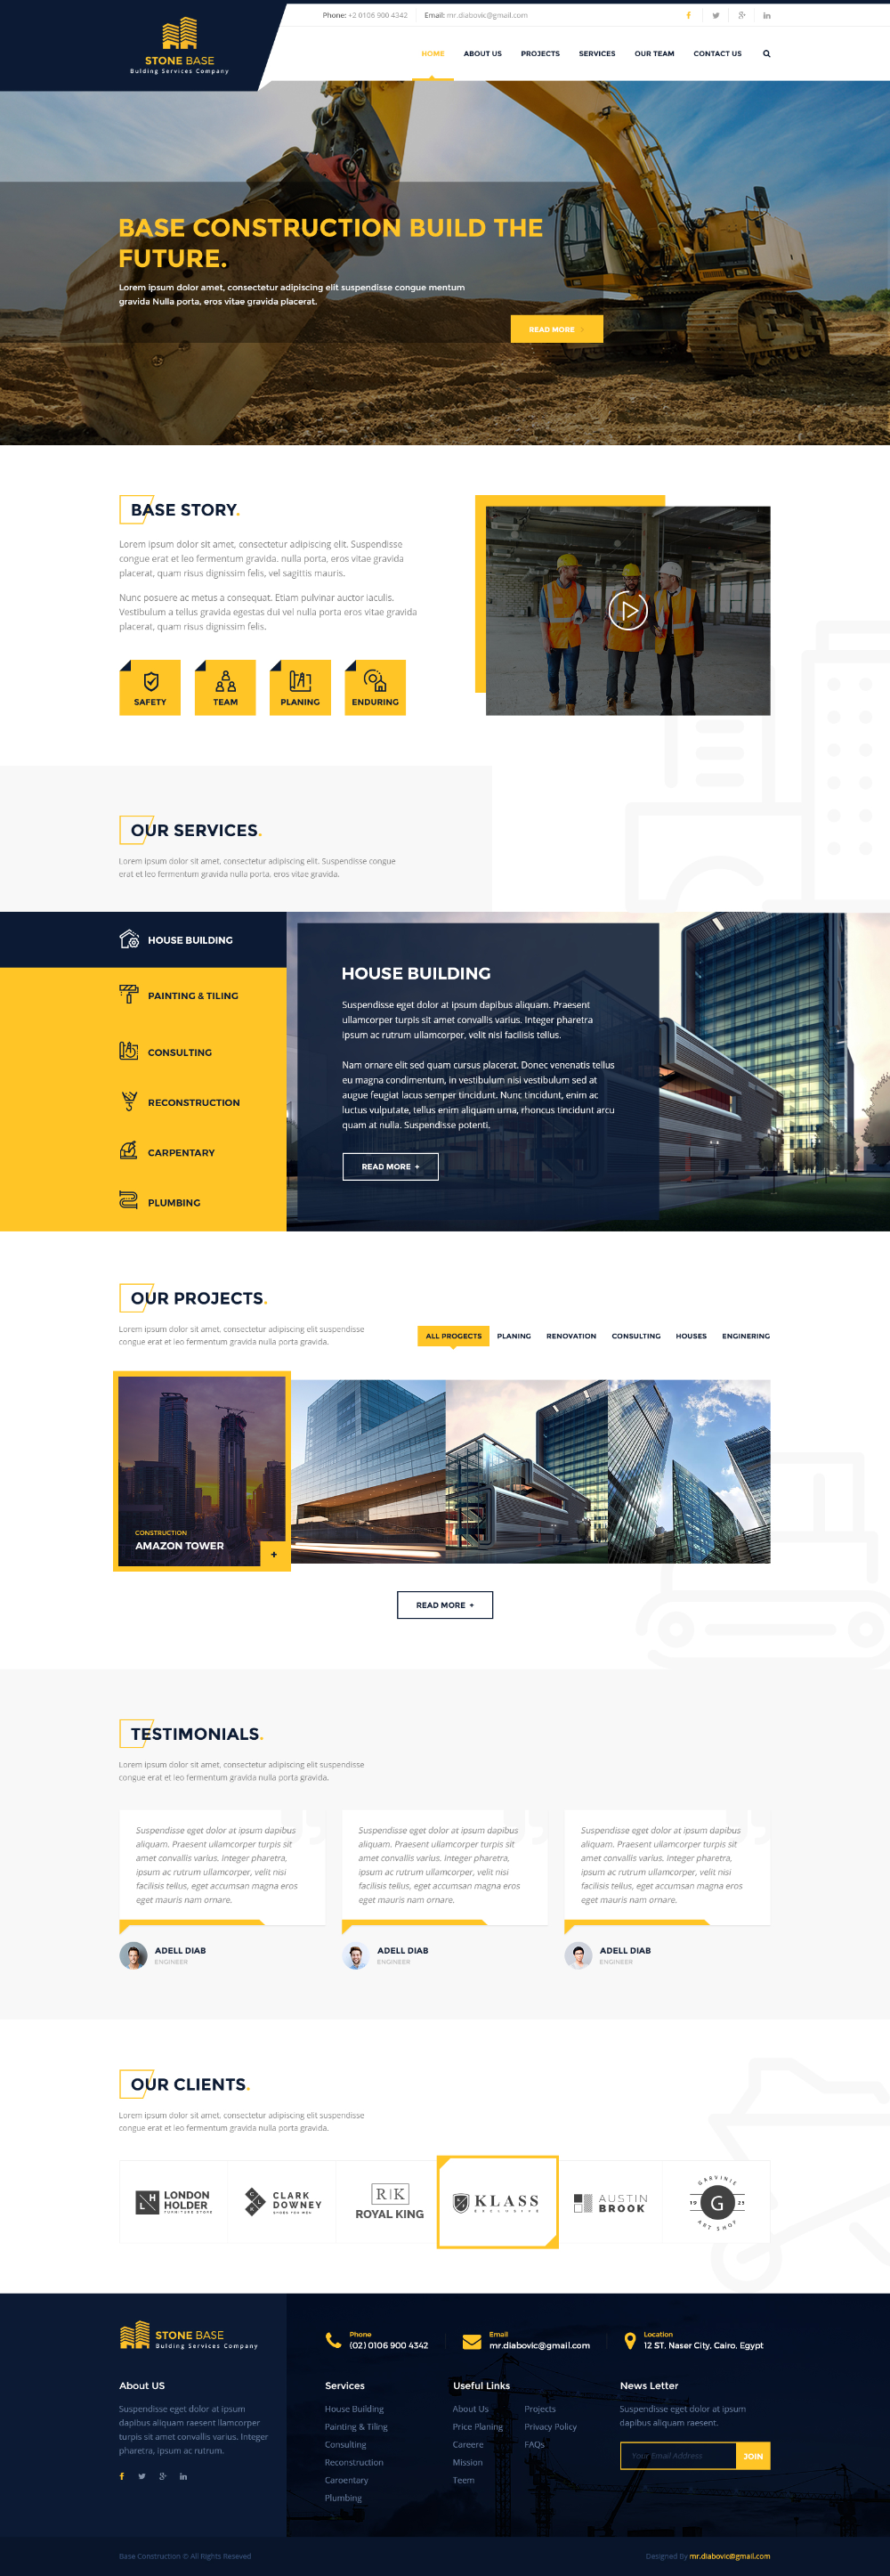 Webdesign In 2020 Modern Website Design Web Layout Design Website Design Layout